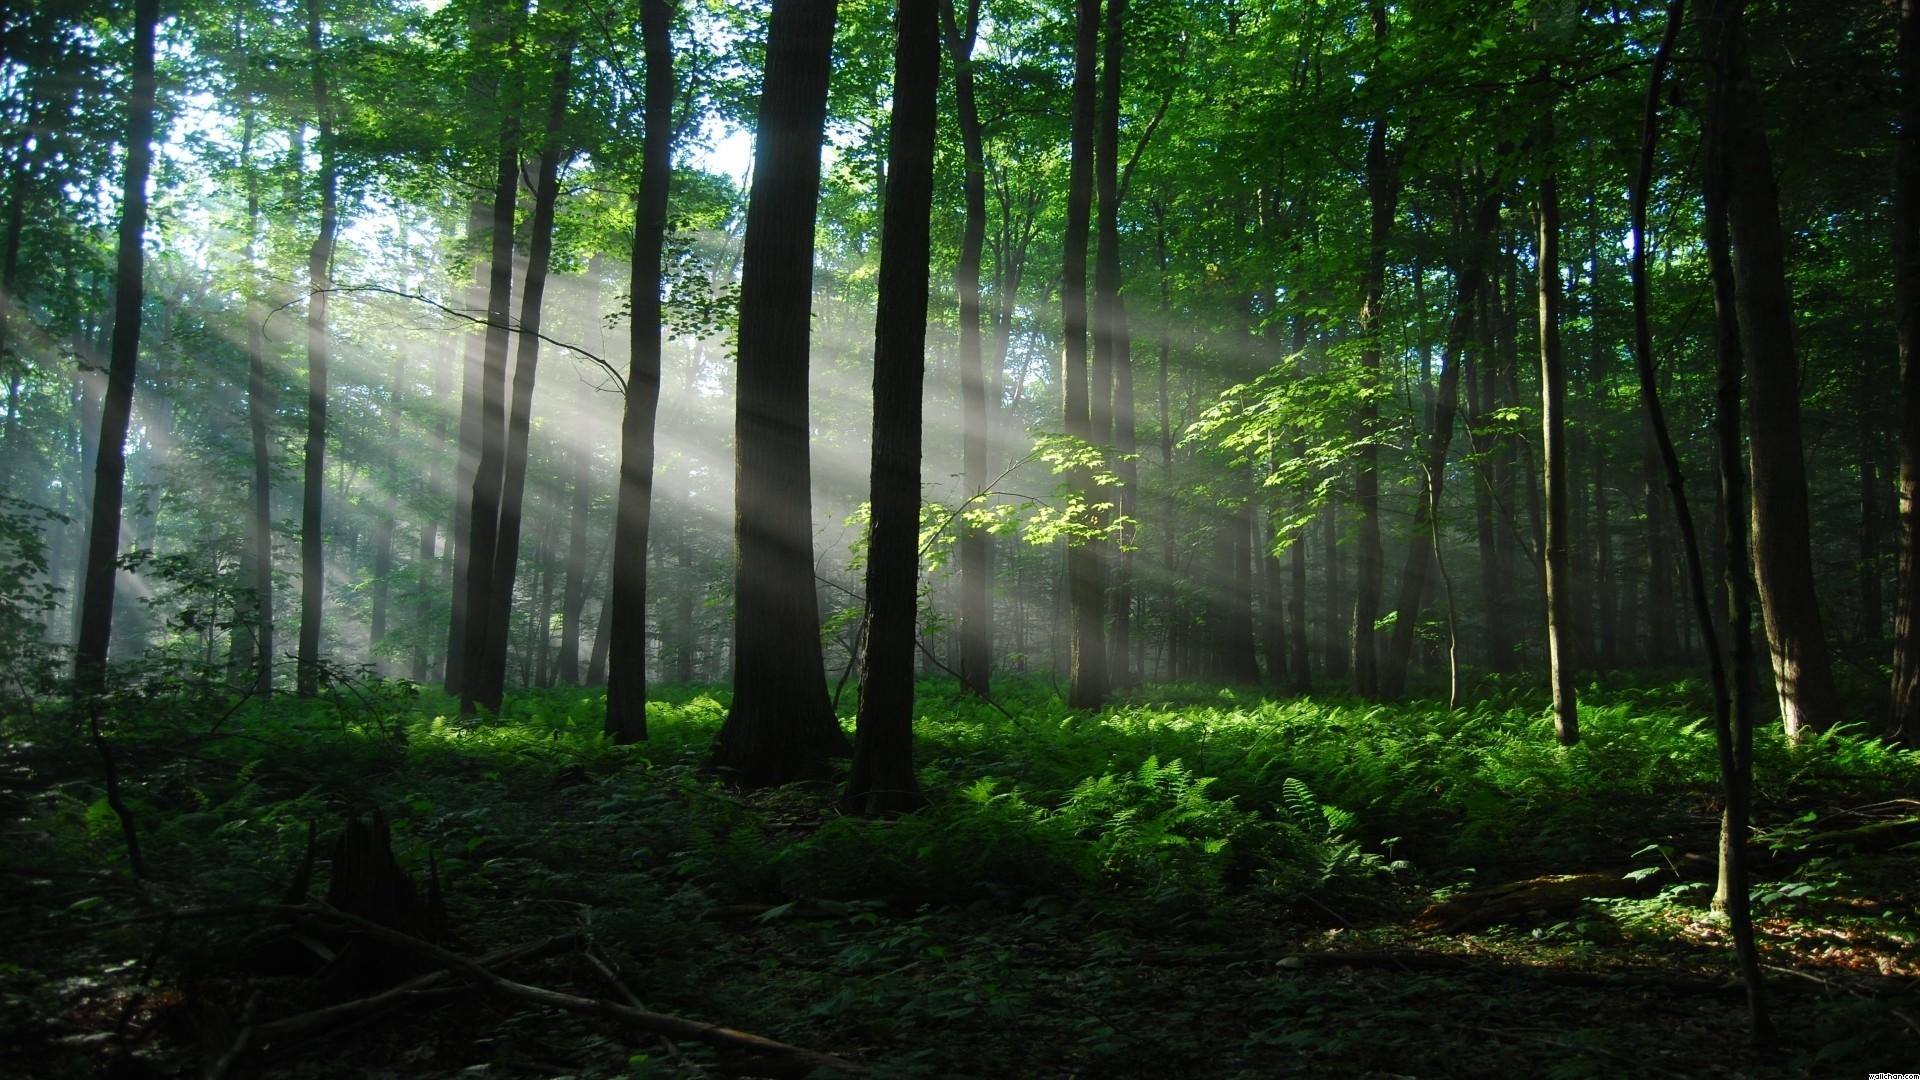 nature forest wallpaper,forest,nature,natural landscape,woodland,tree